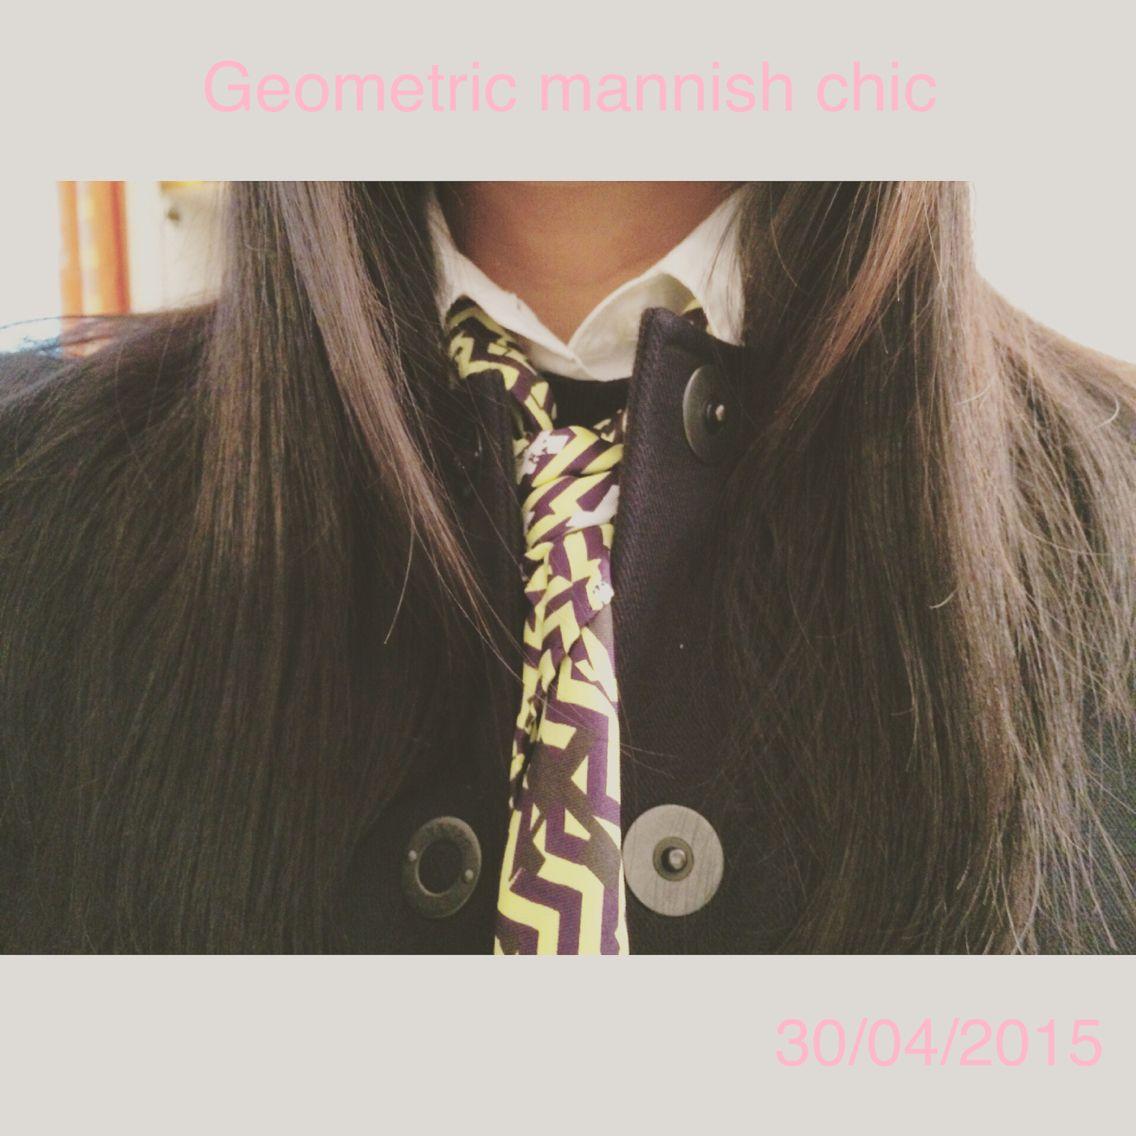 Geometric mannish chic